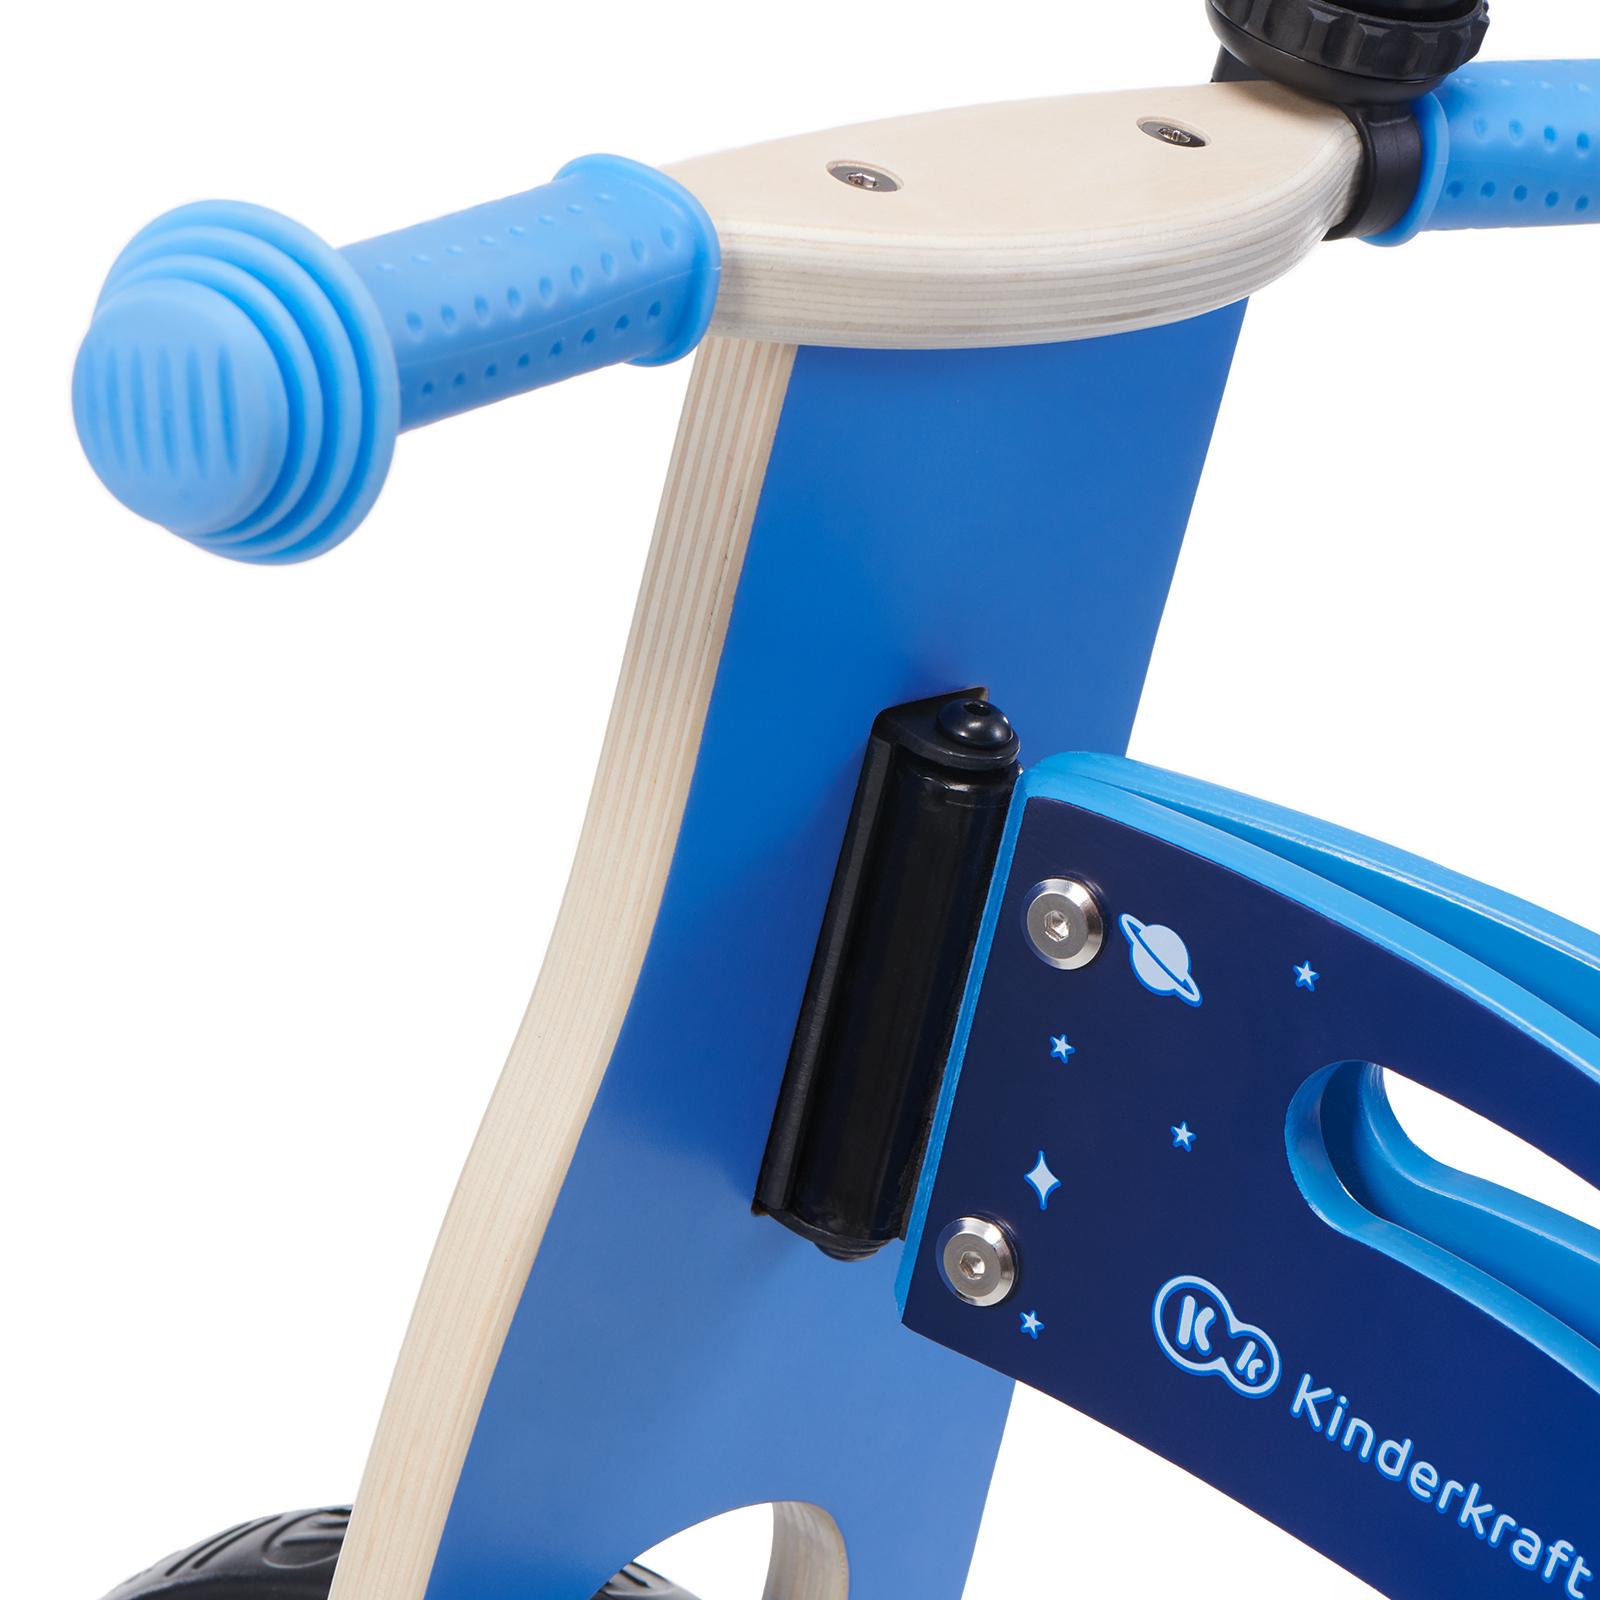 Balans bicikl guralica Kinderkraft GALAXY blue, volan